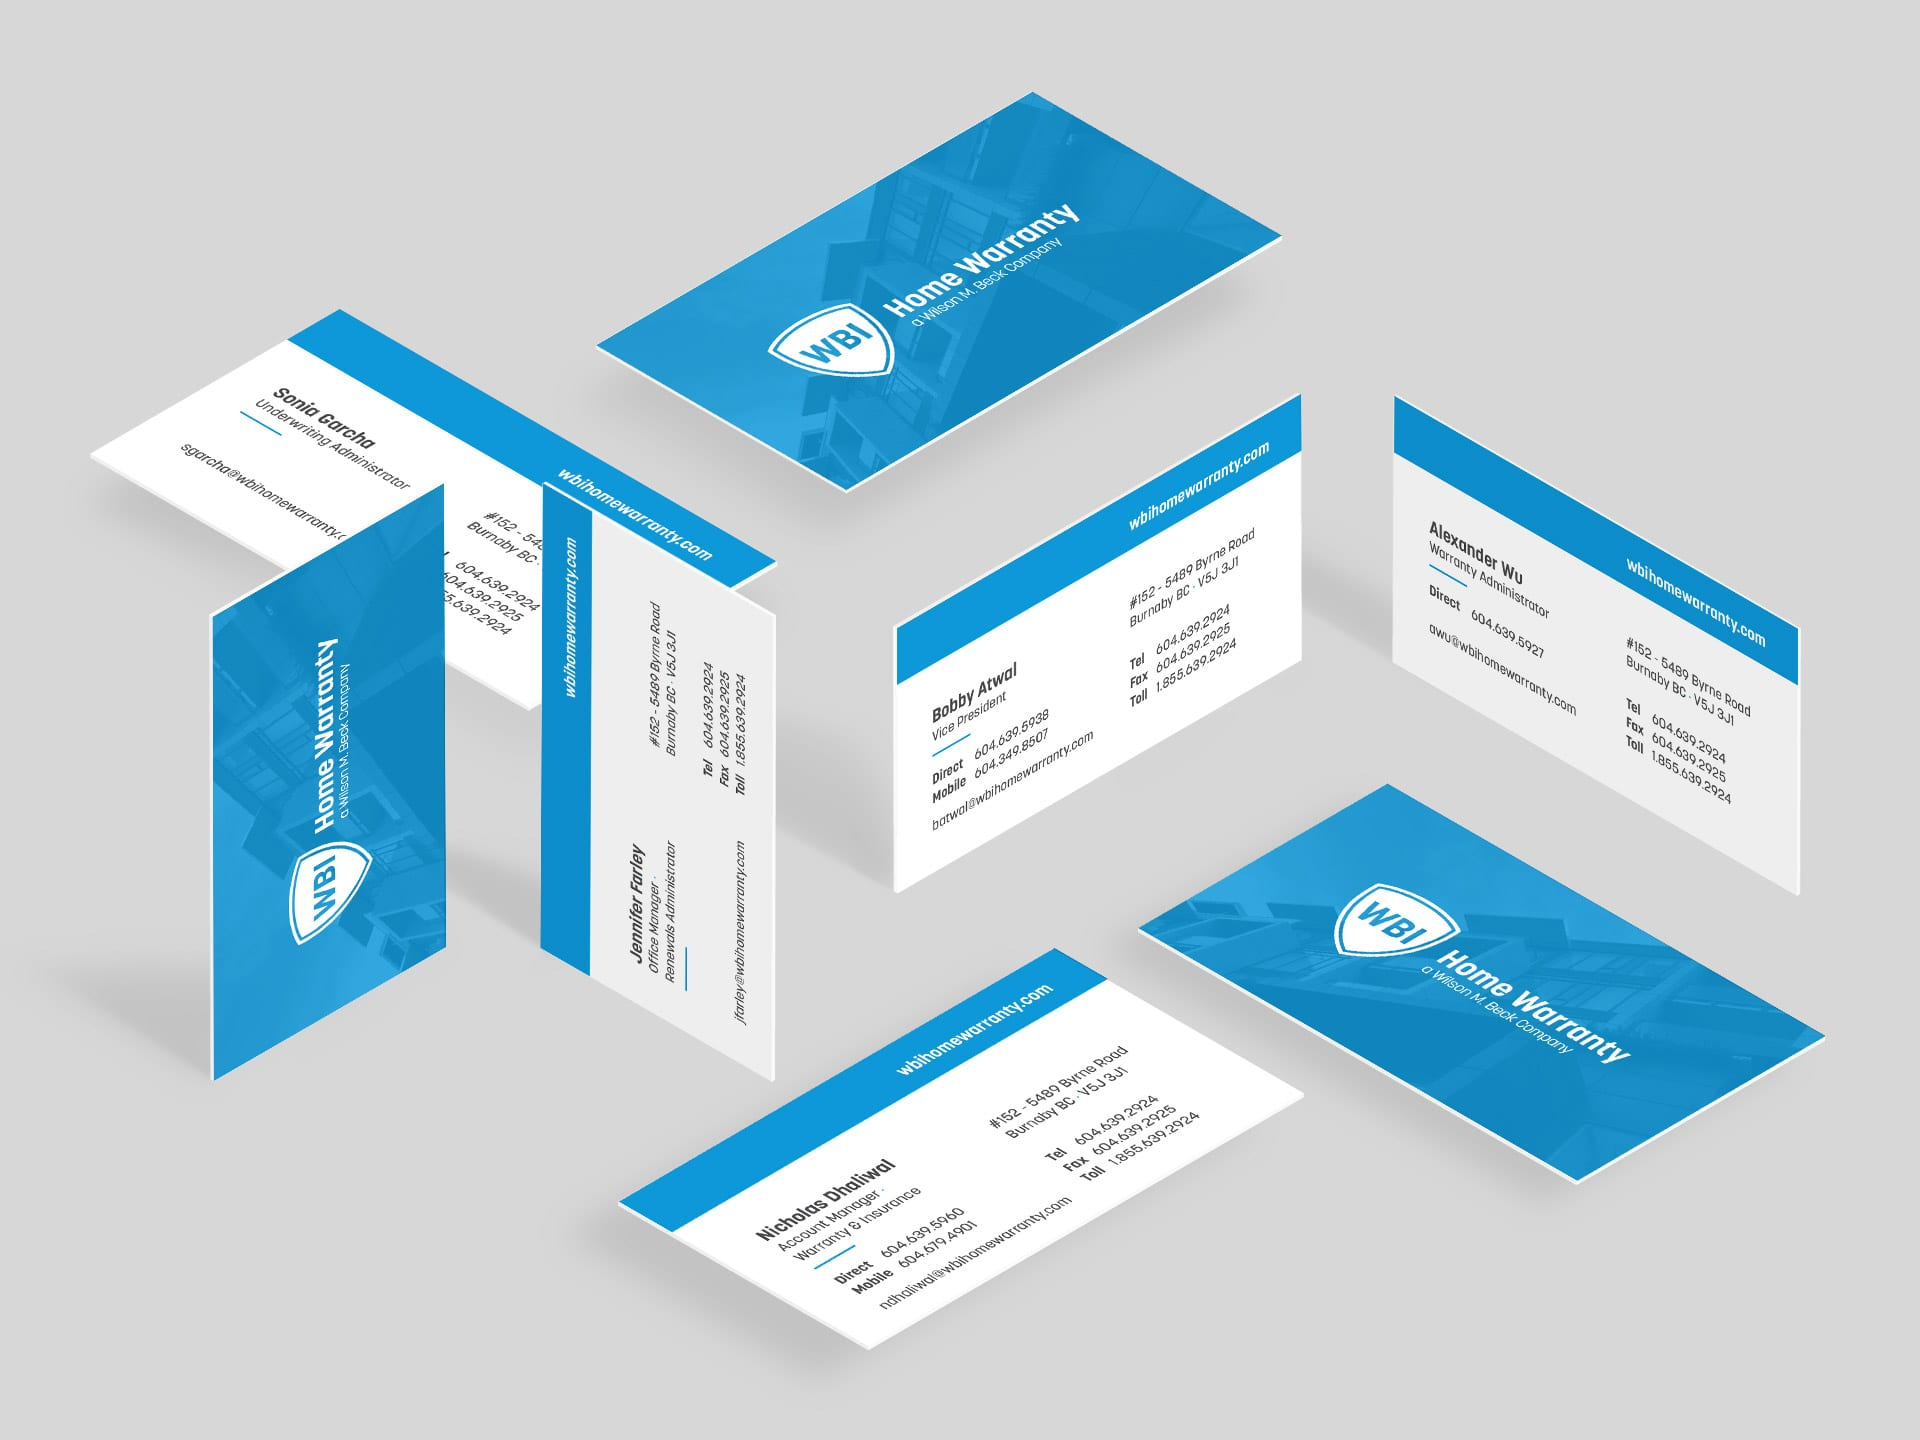 Y5 Creative Case Studies WBI Home Warranty Business Cards 2019